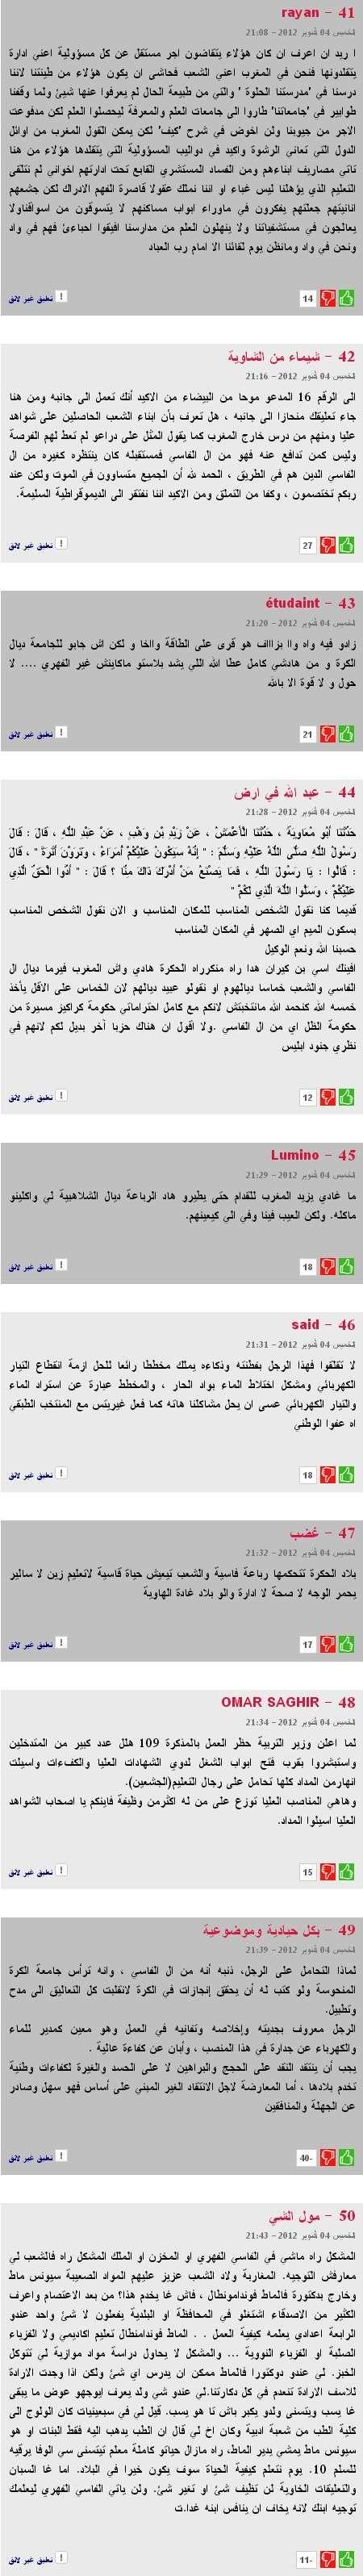 Réactions des marocains envers la nomination de ALi Fassi Ali510